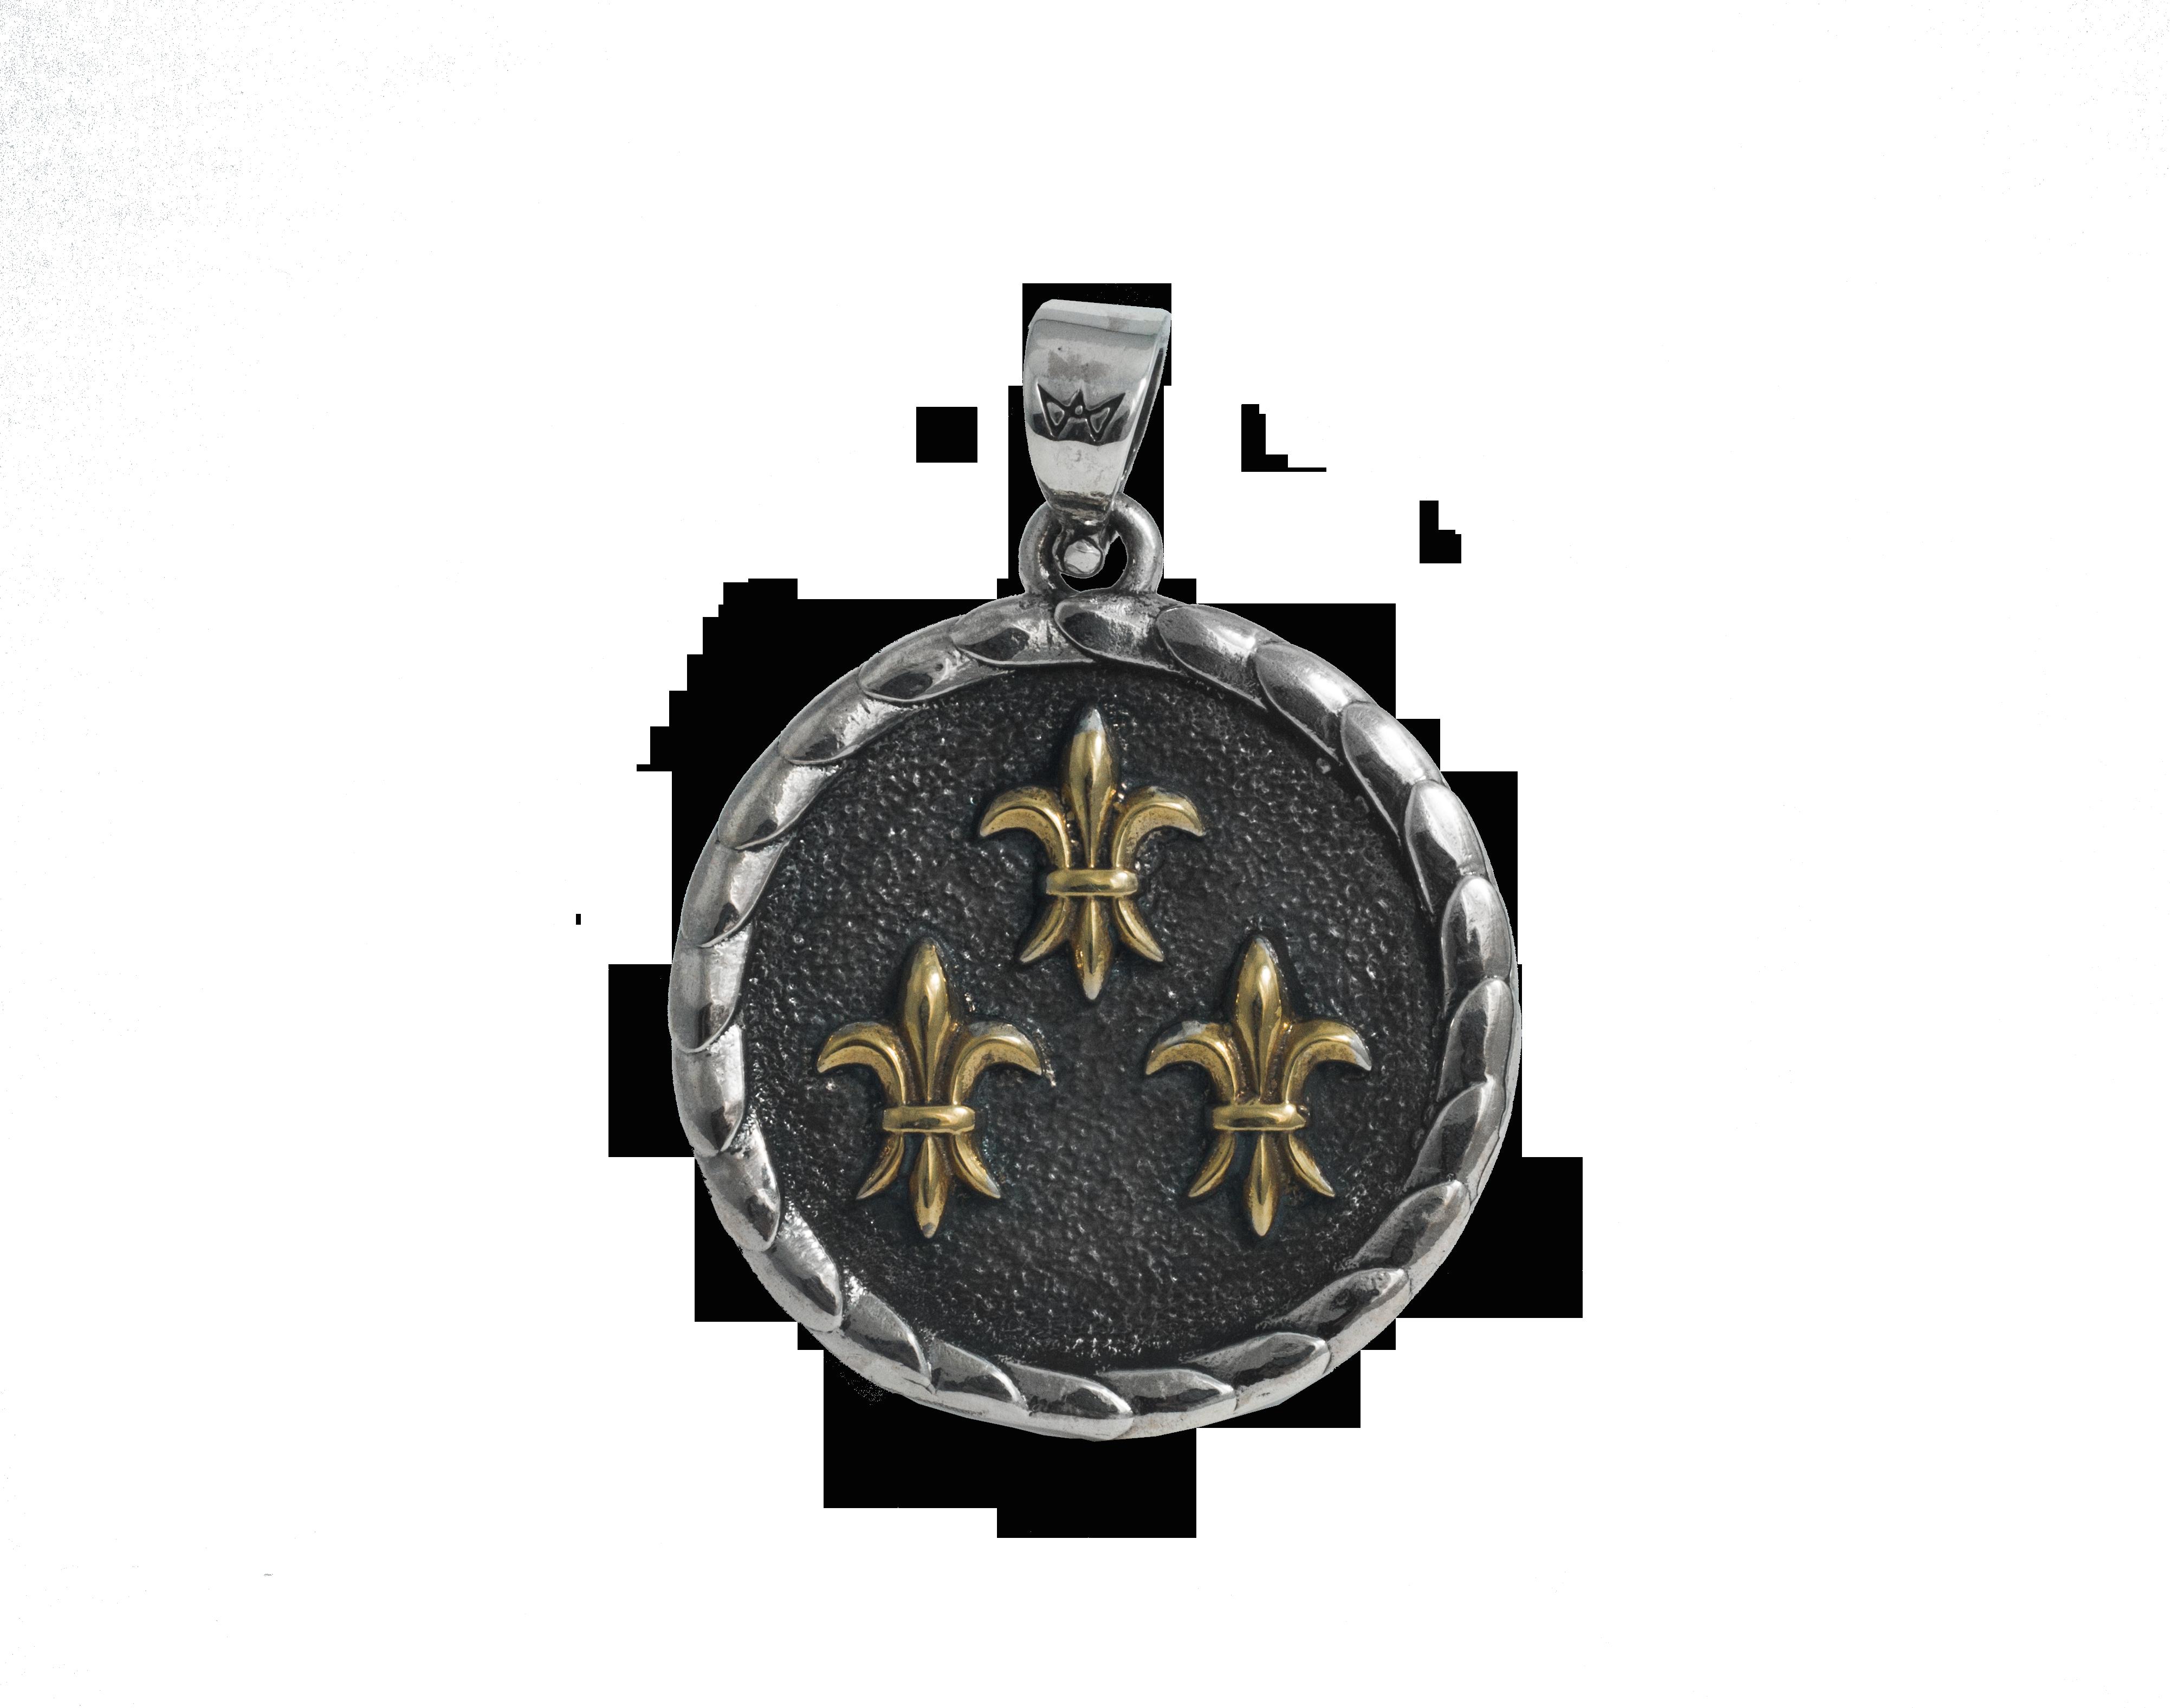 Vernon Roche Medallion The Kingdom Of Temeria Emblem